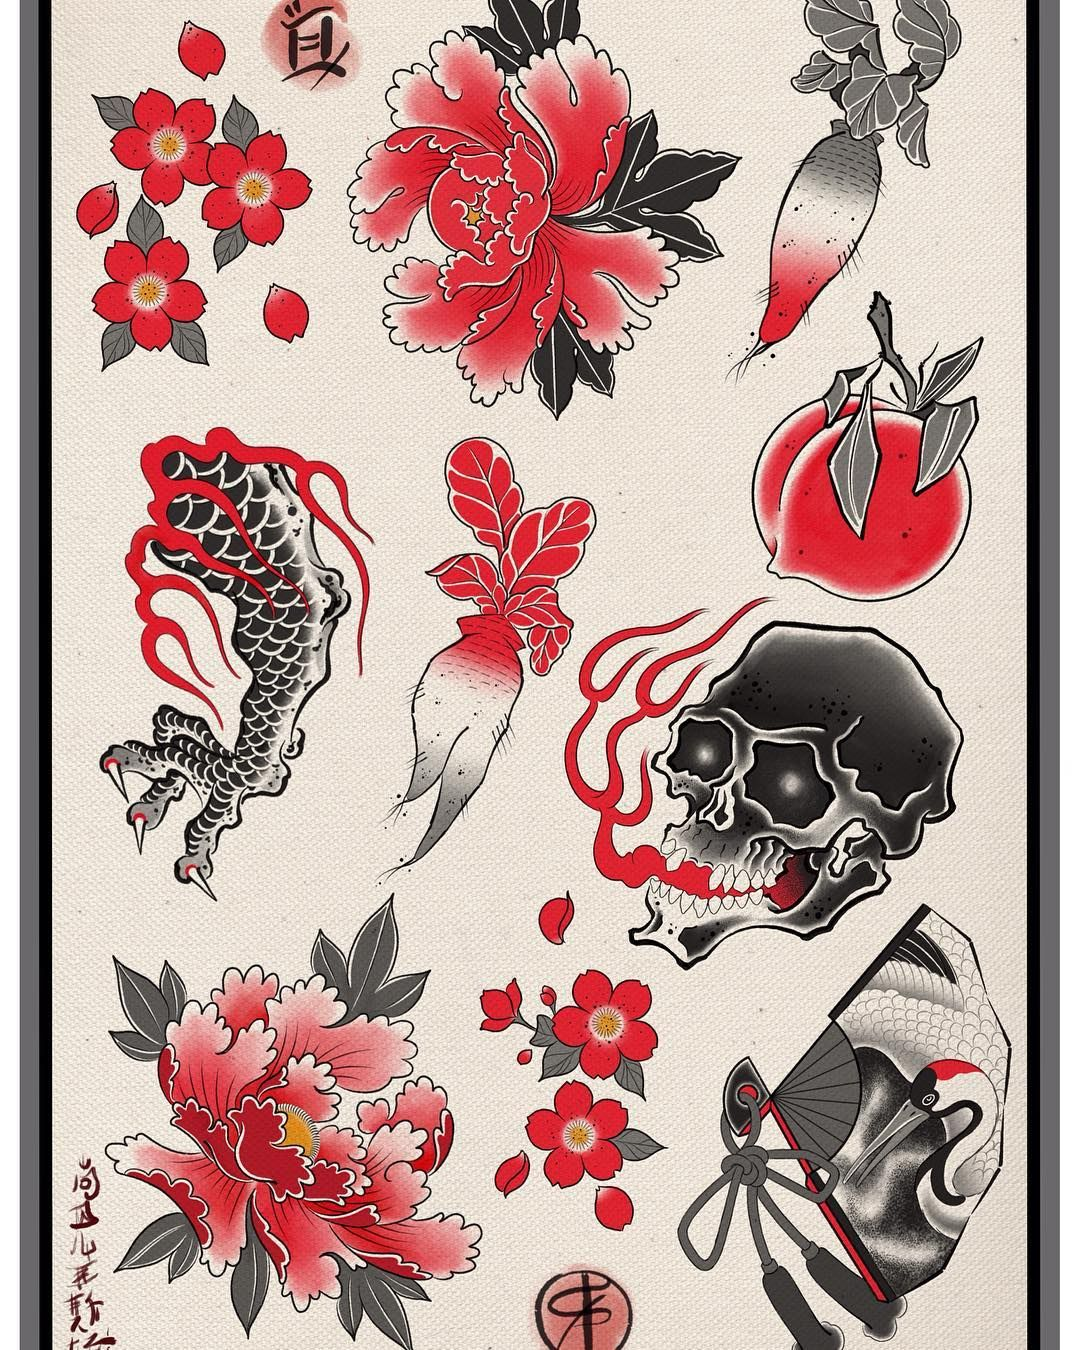 Pin By Daniel Seong On Tattoo Japanese Tattoo Japanese Tattoo Symbols Japanese Flower Tattoo